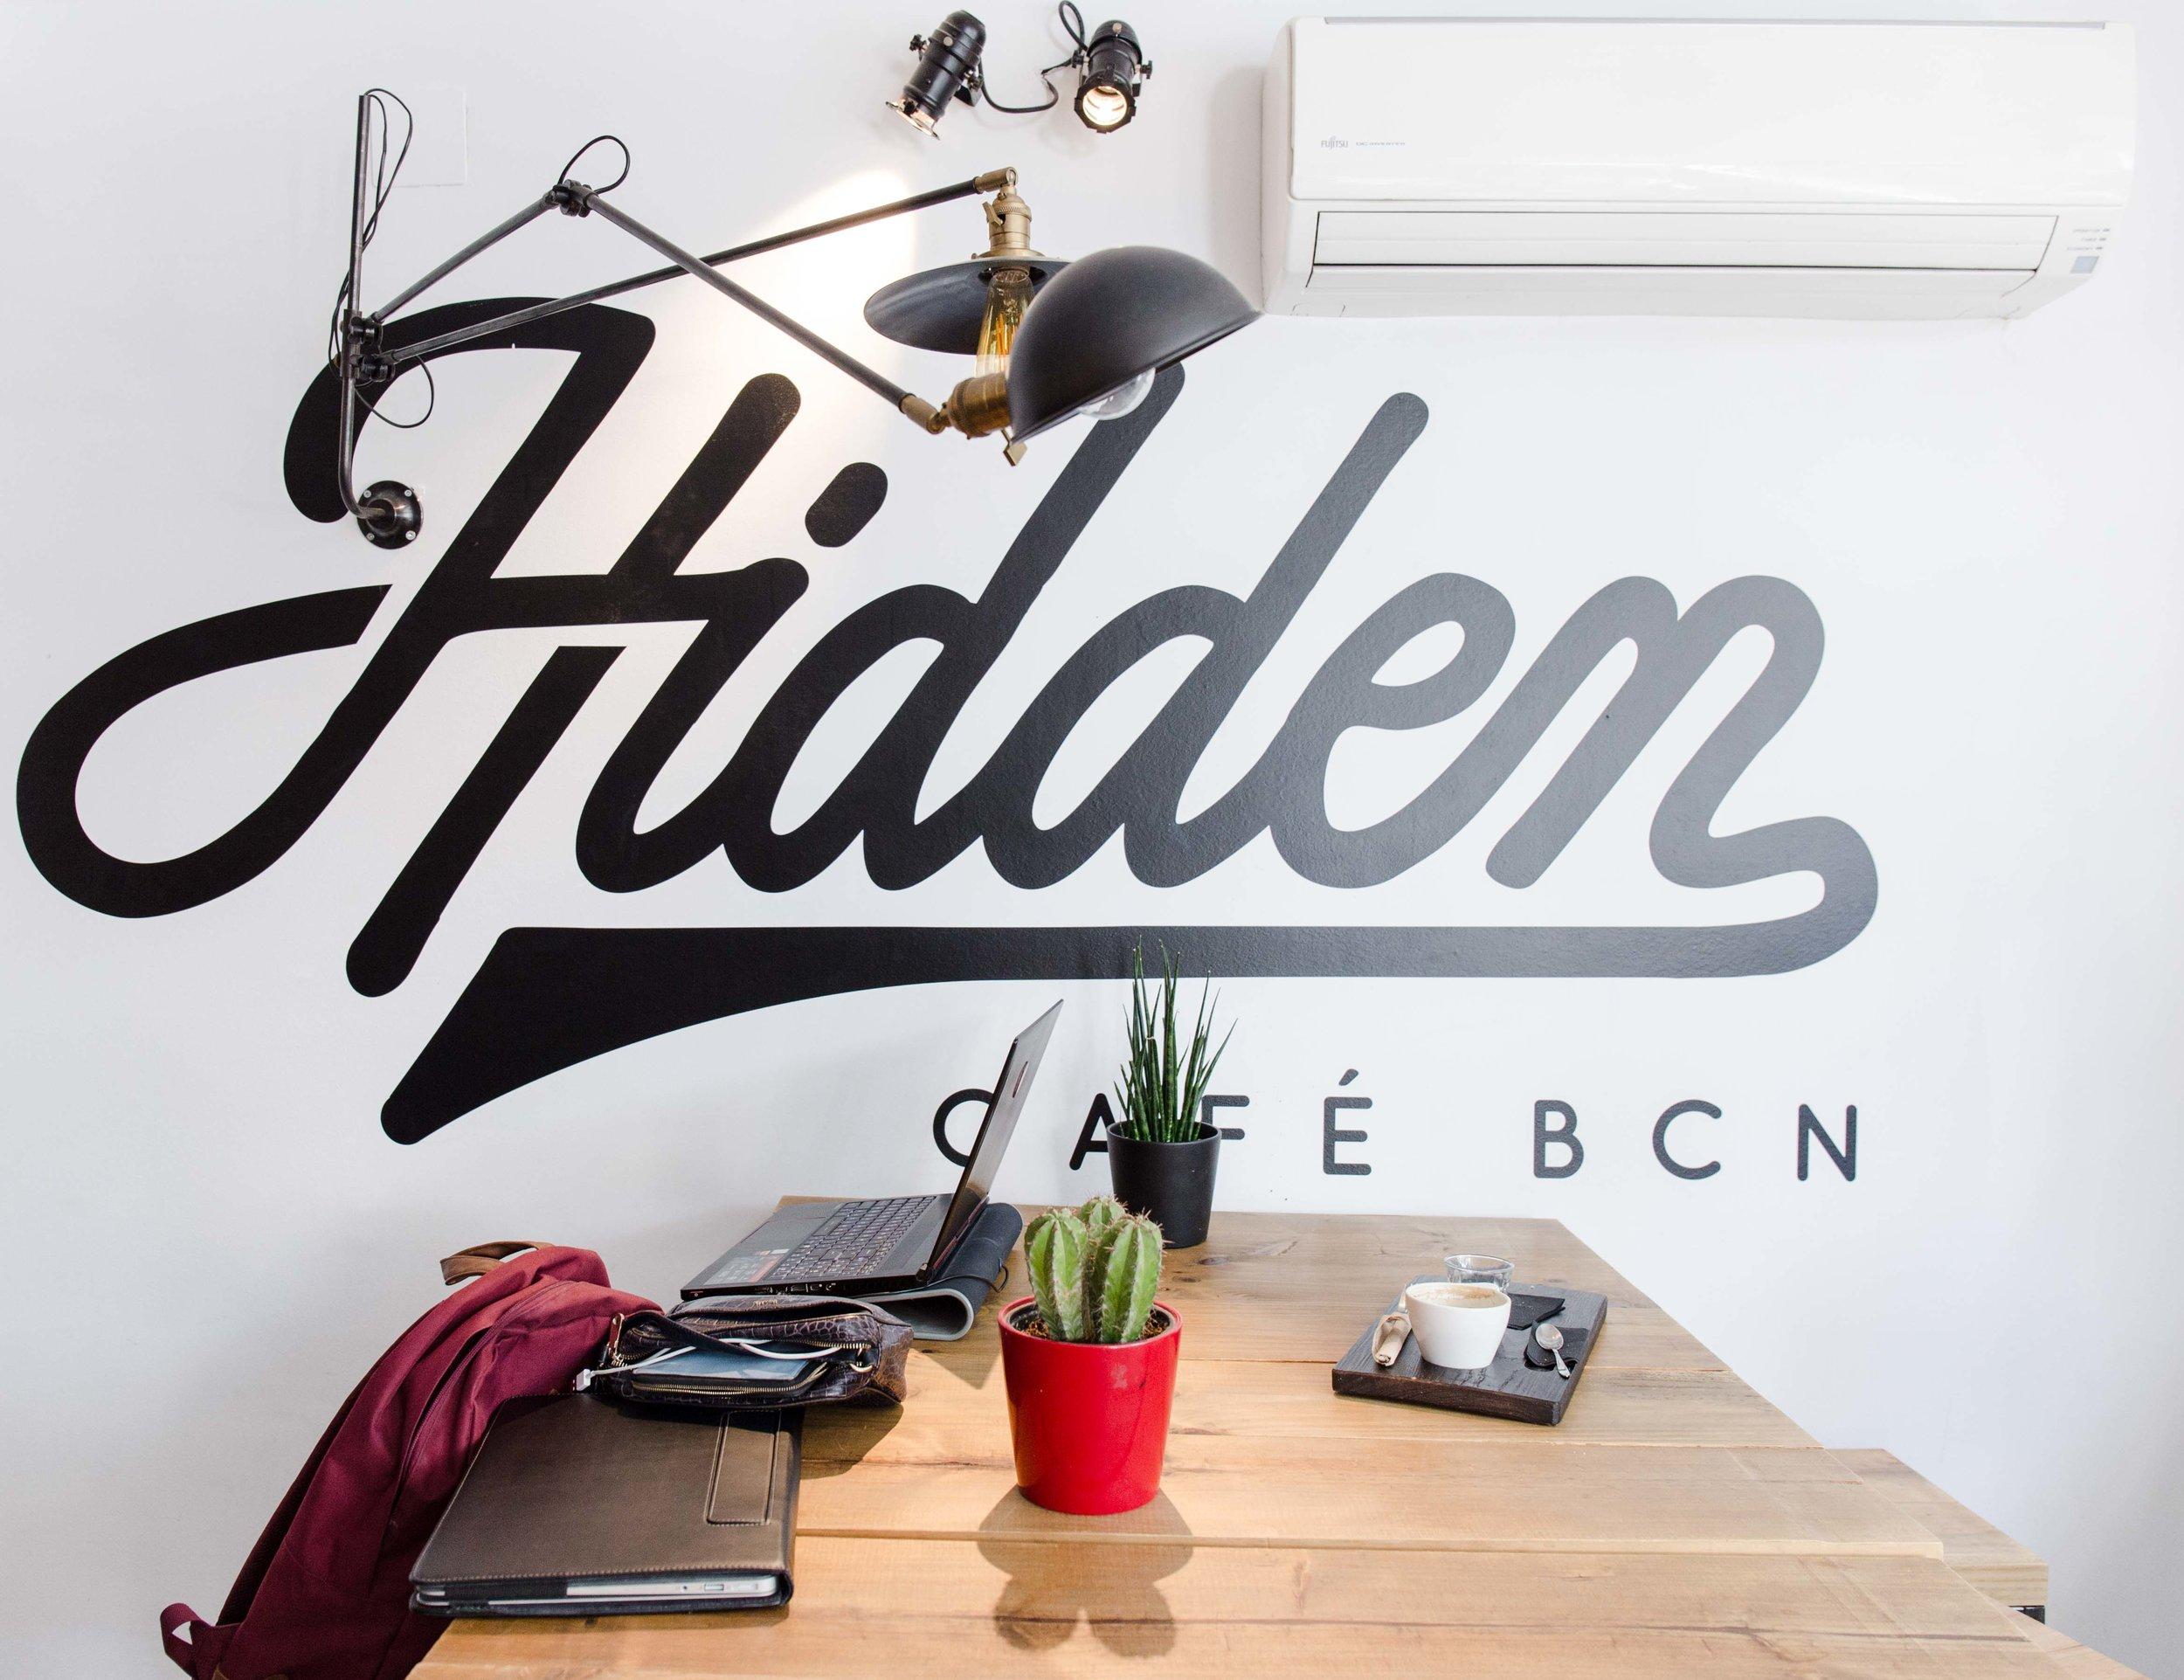 hidden cafe barcelona